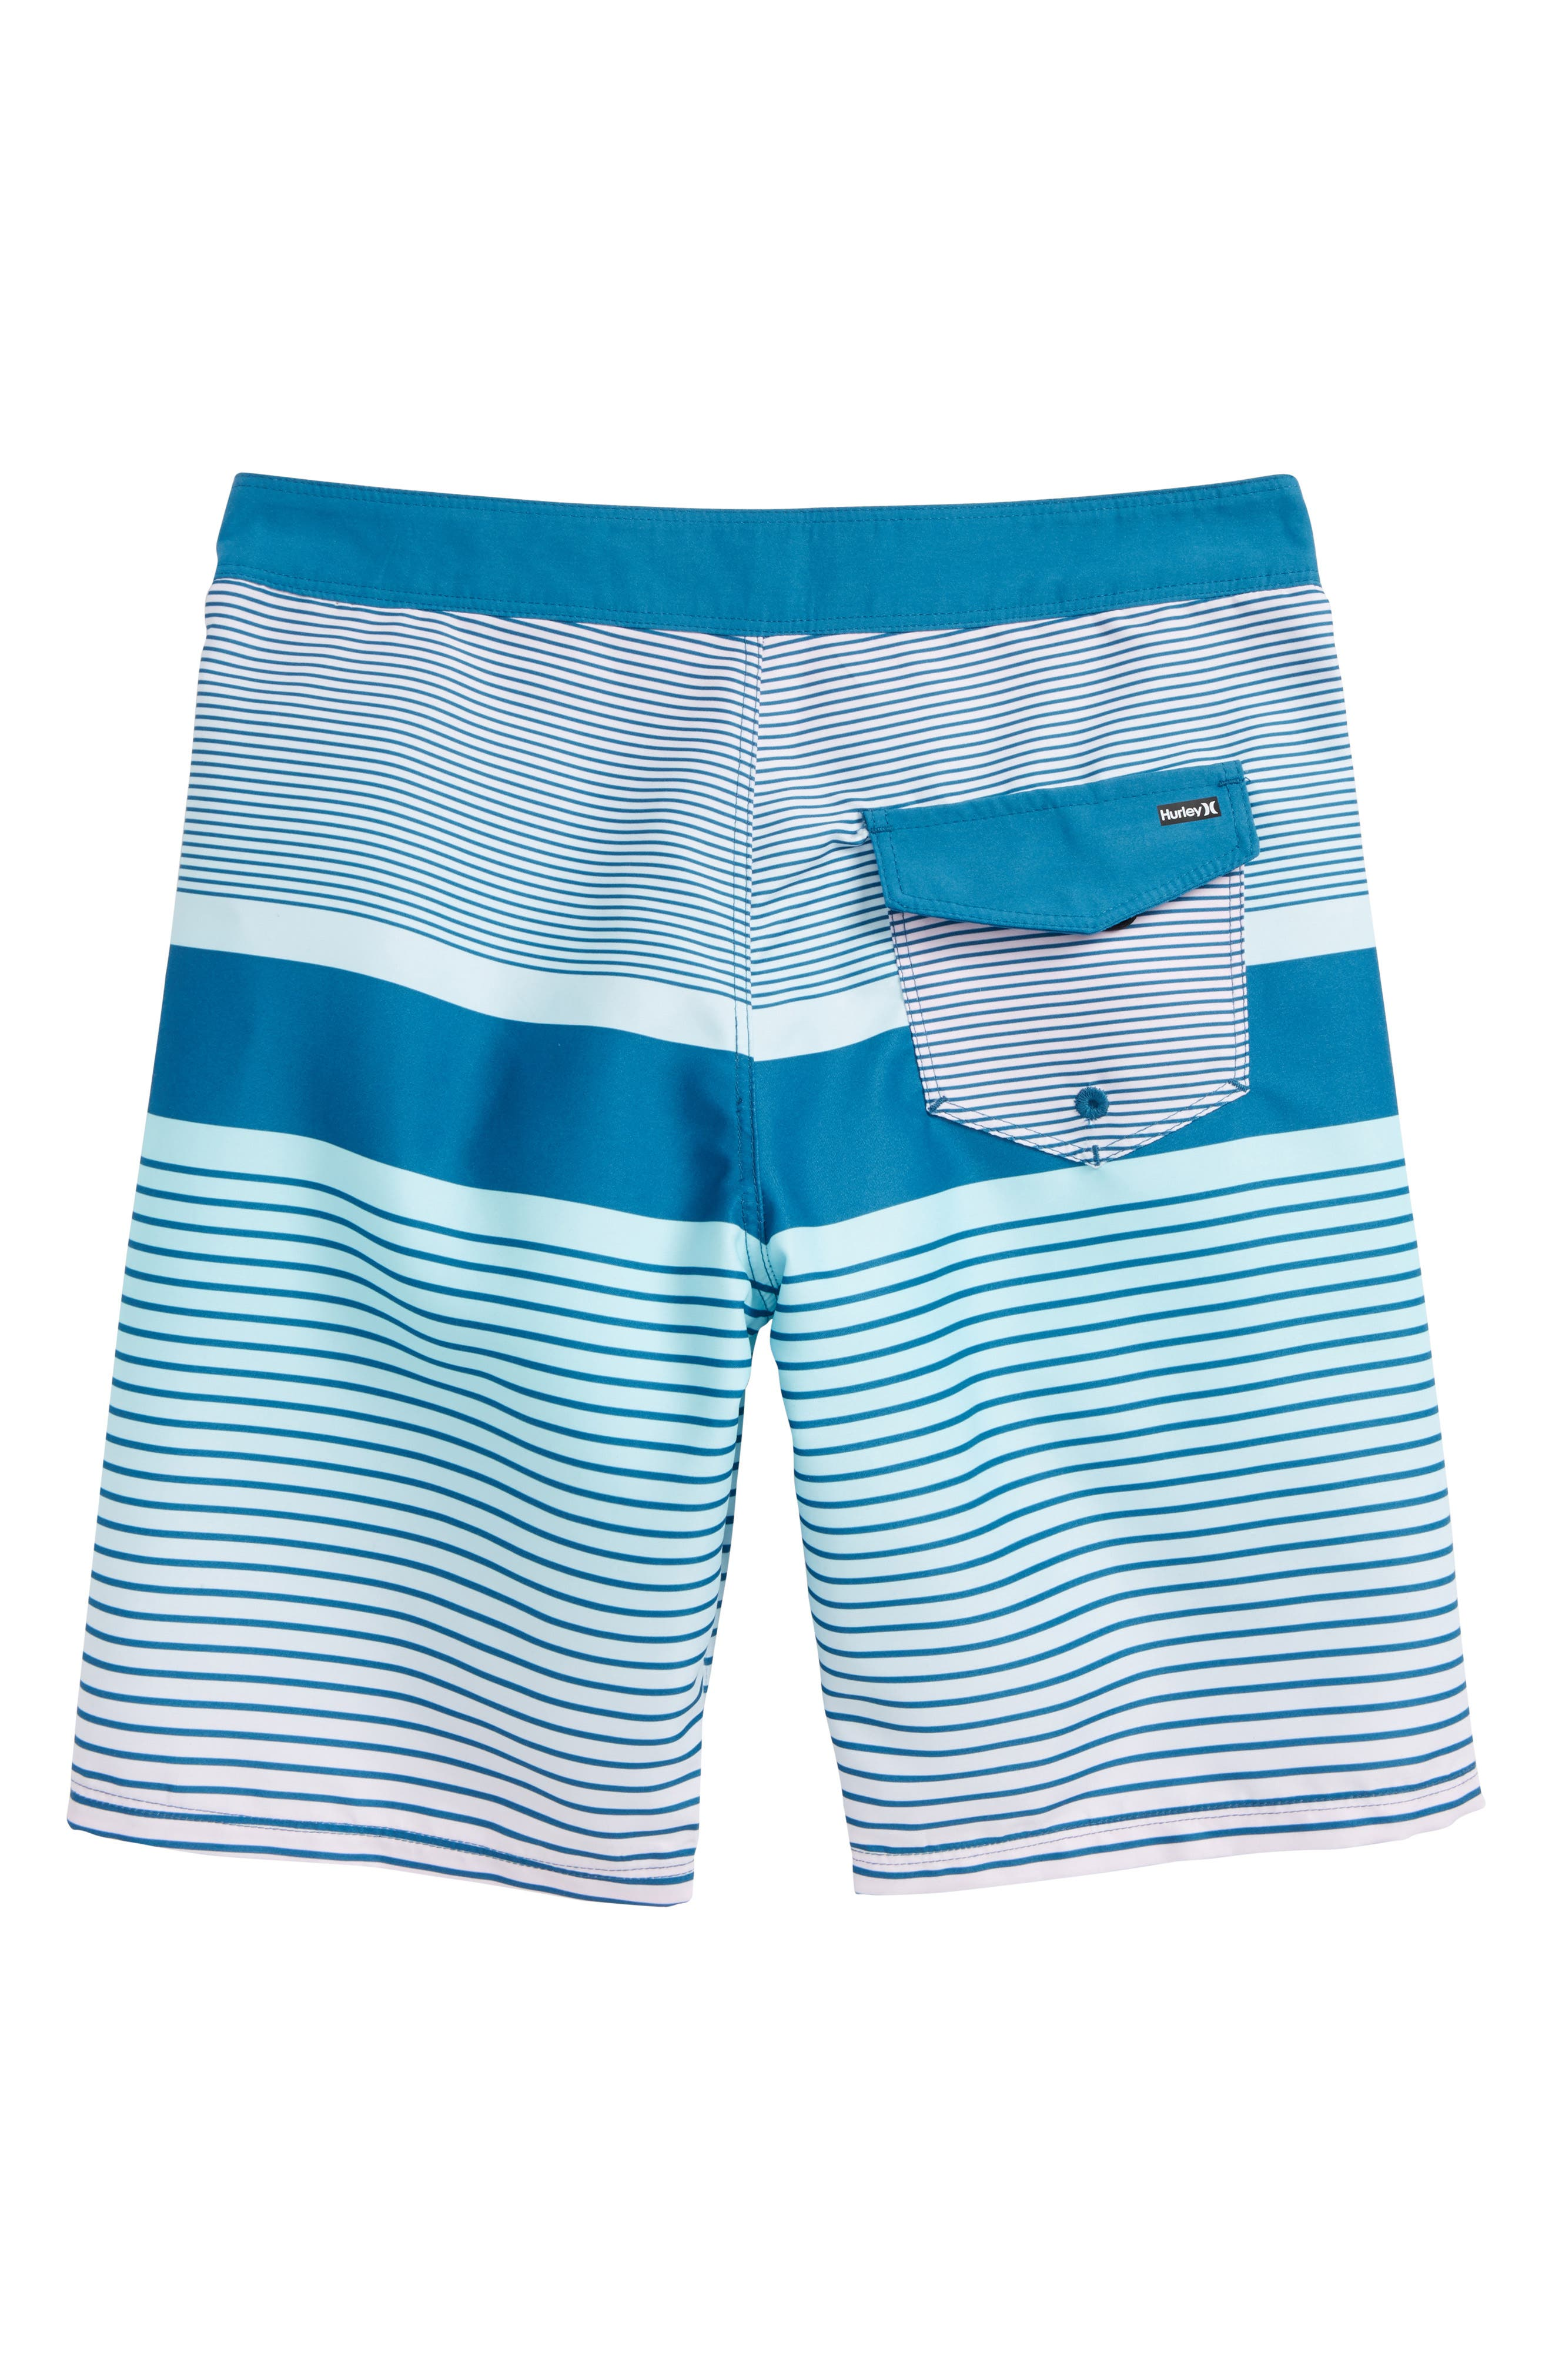 Line Up Board Shorts,                             Alternate thumbnail 2, color,                             Rift Blue